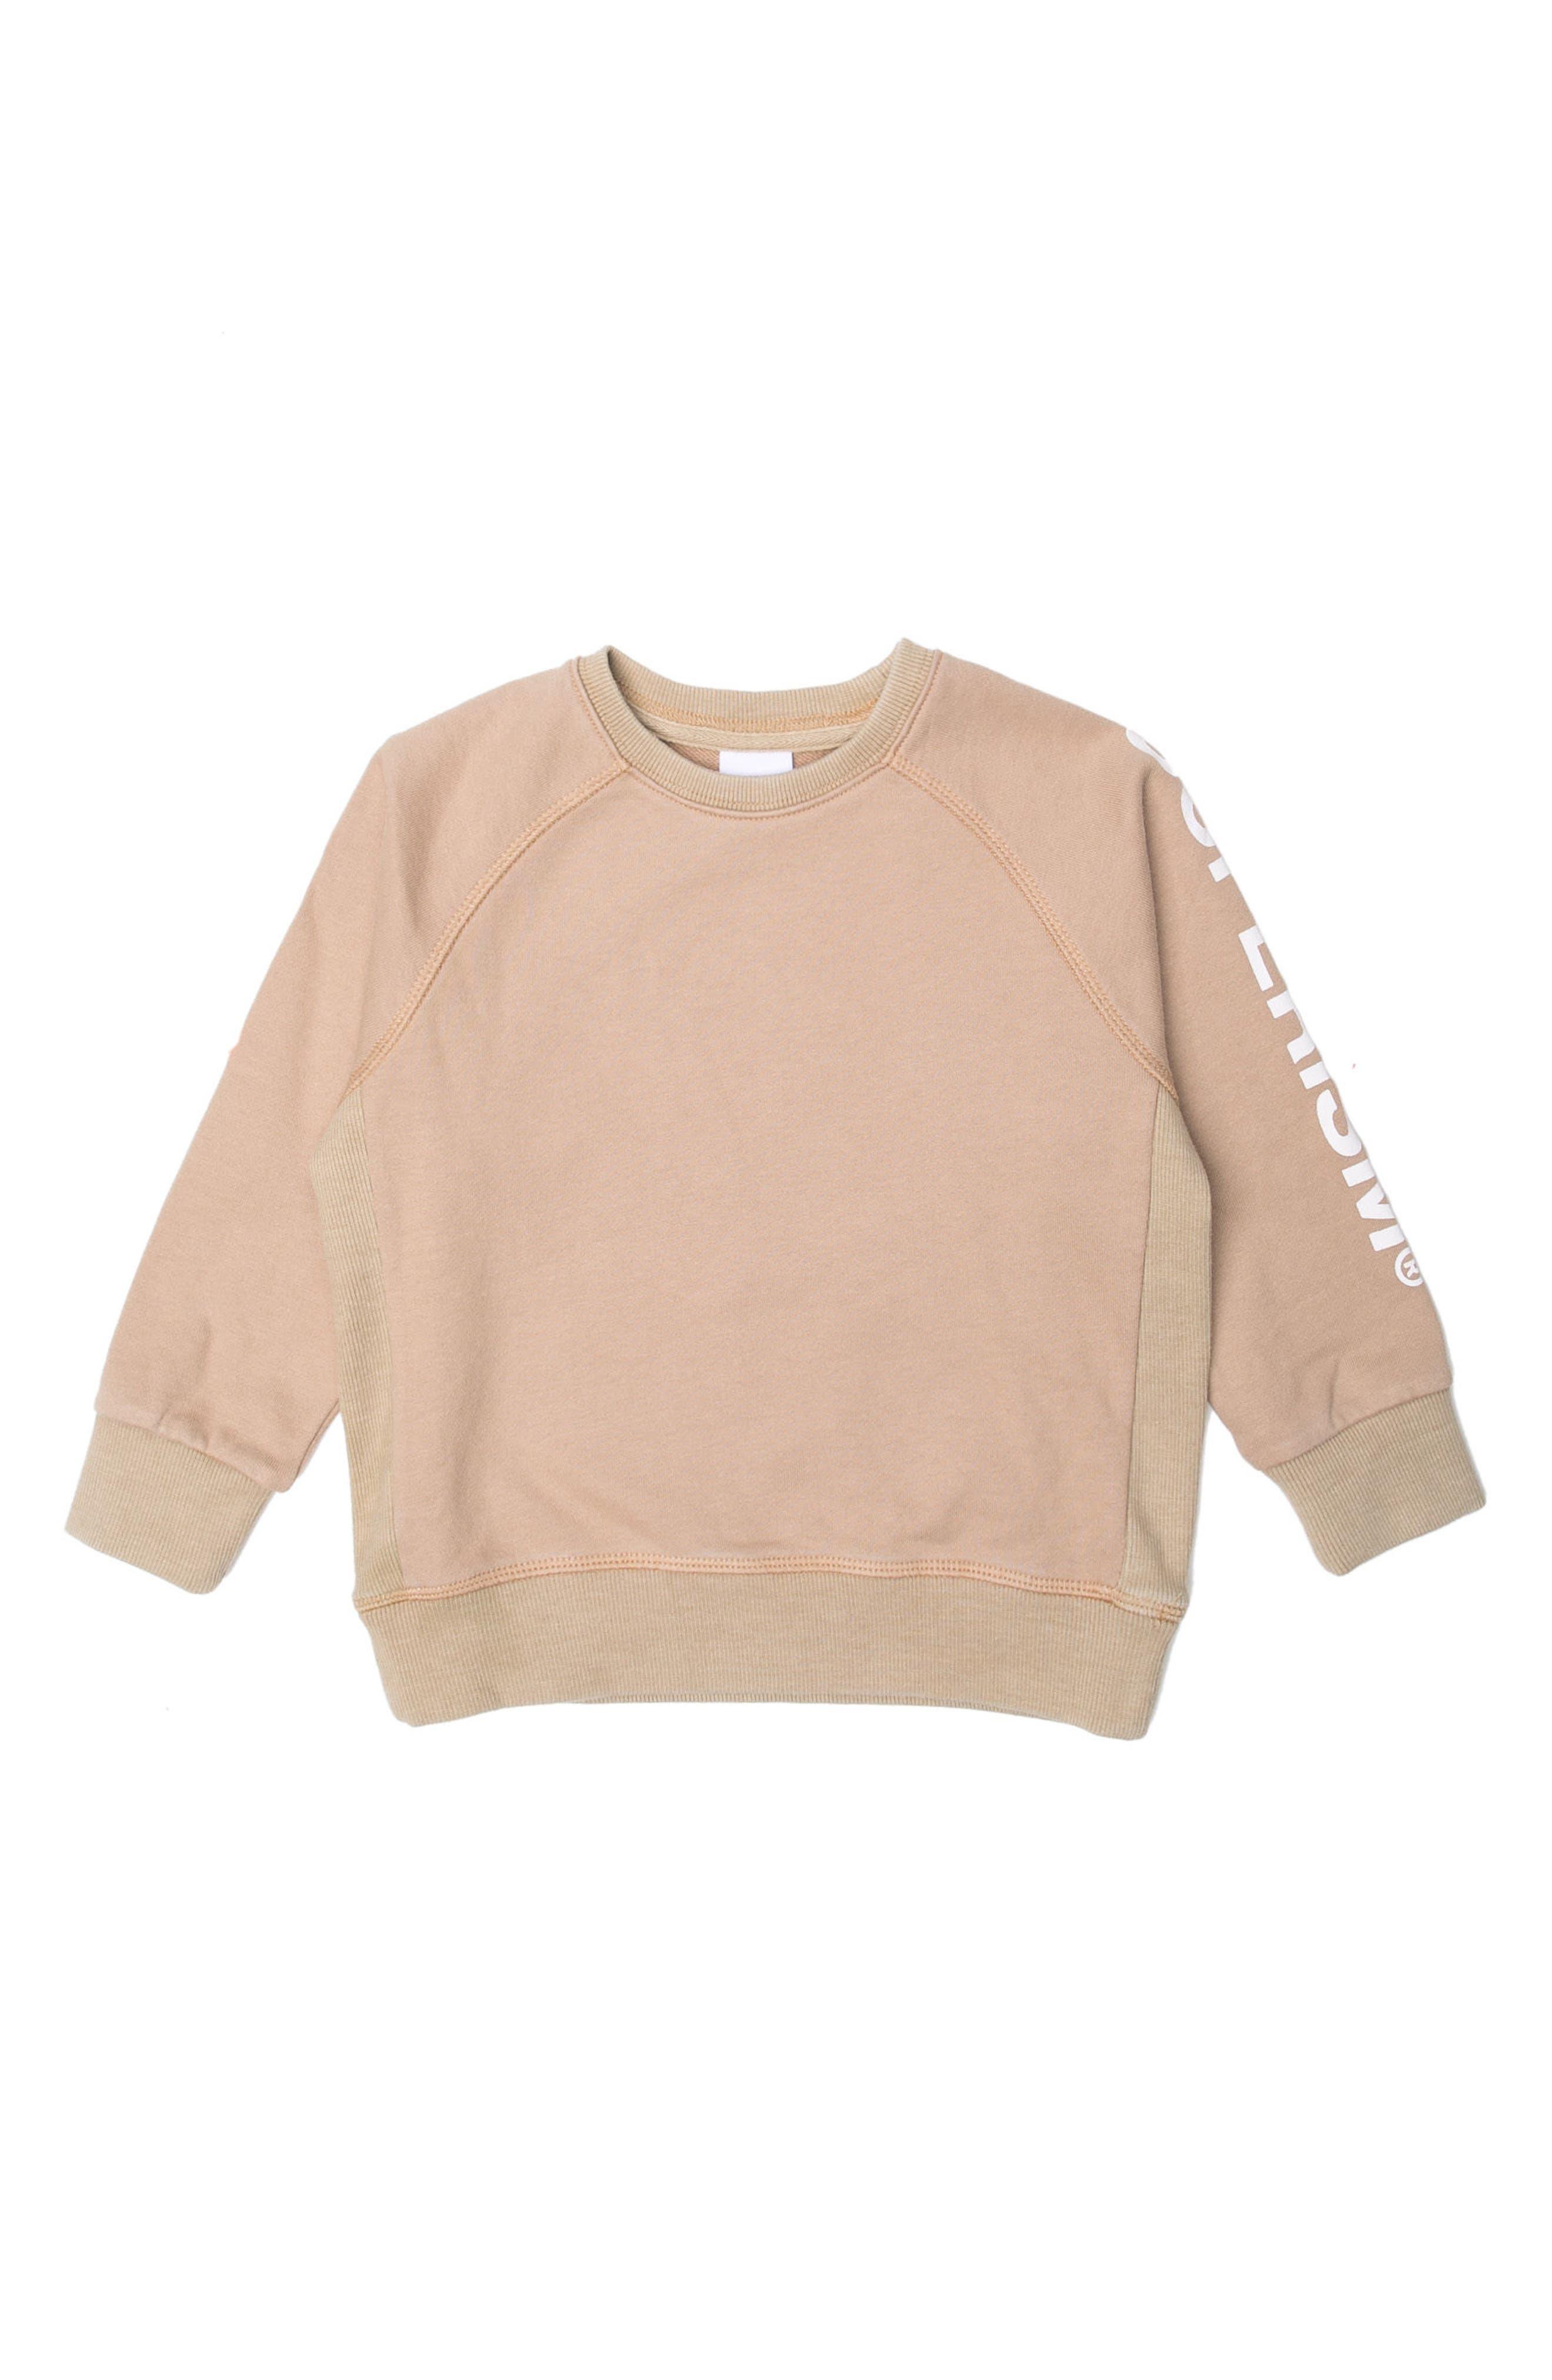 Andy Fleece Sweatshirt,                             Main thumbnail 1, color,                             SAND